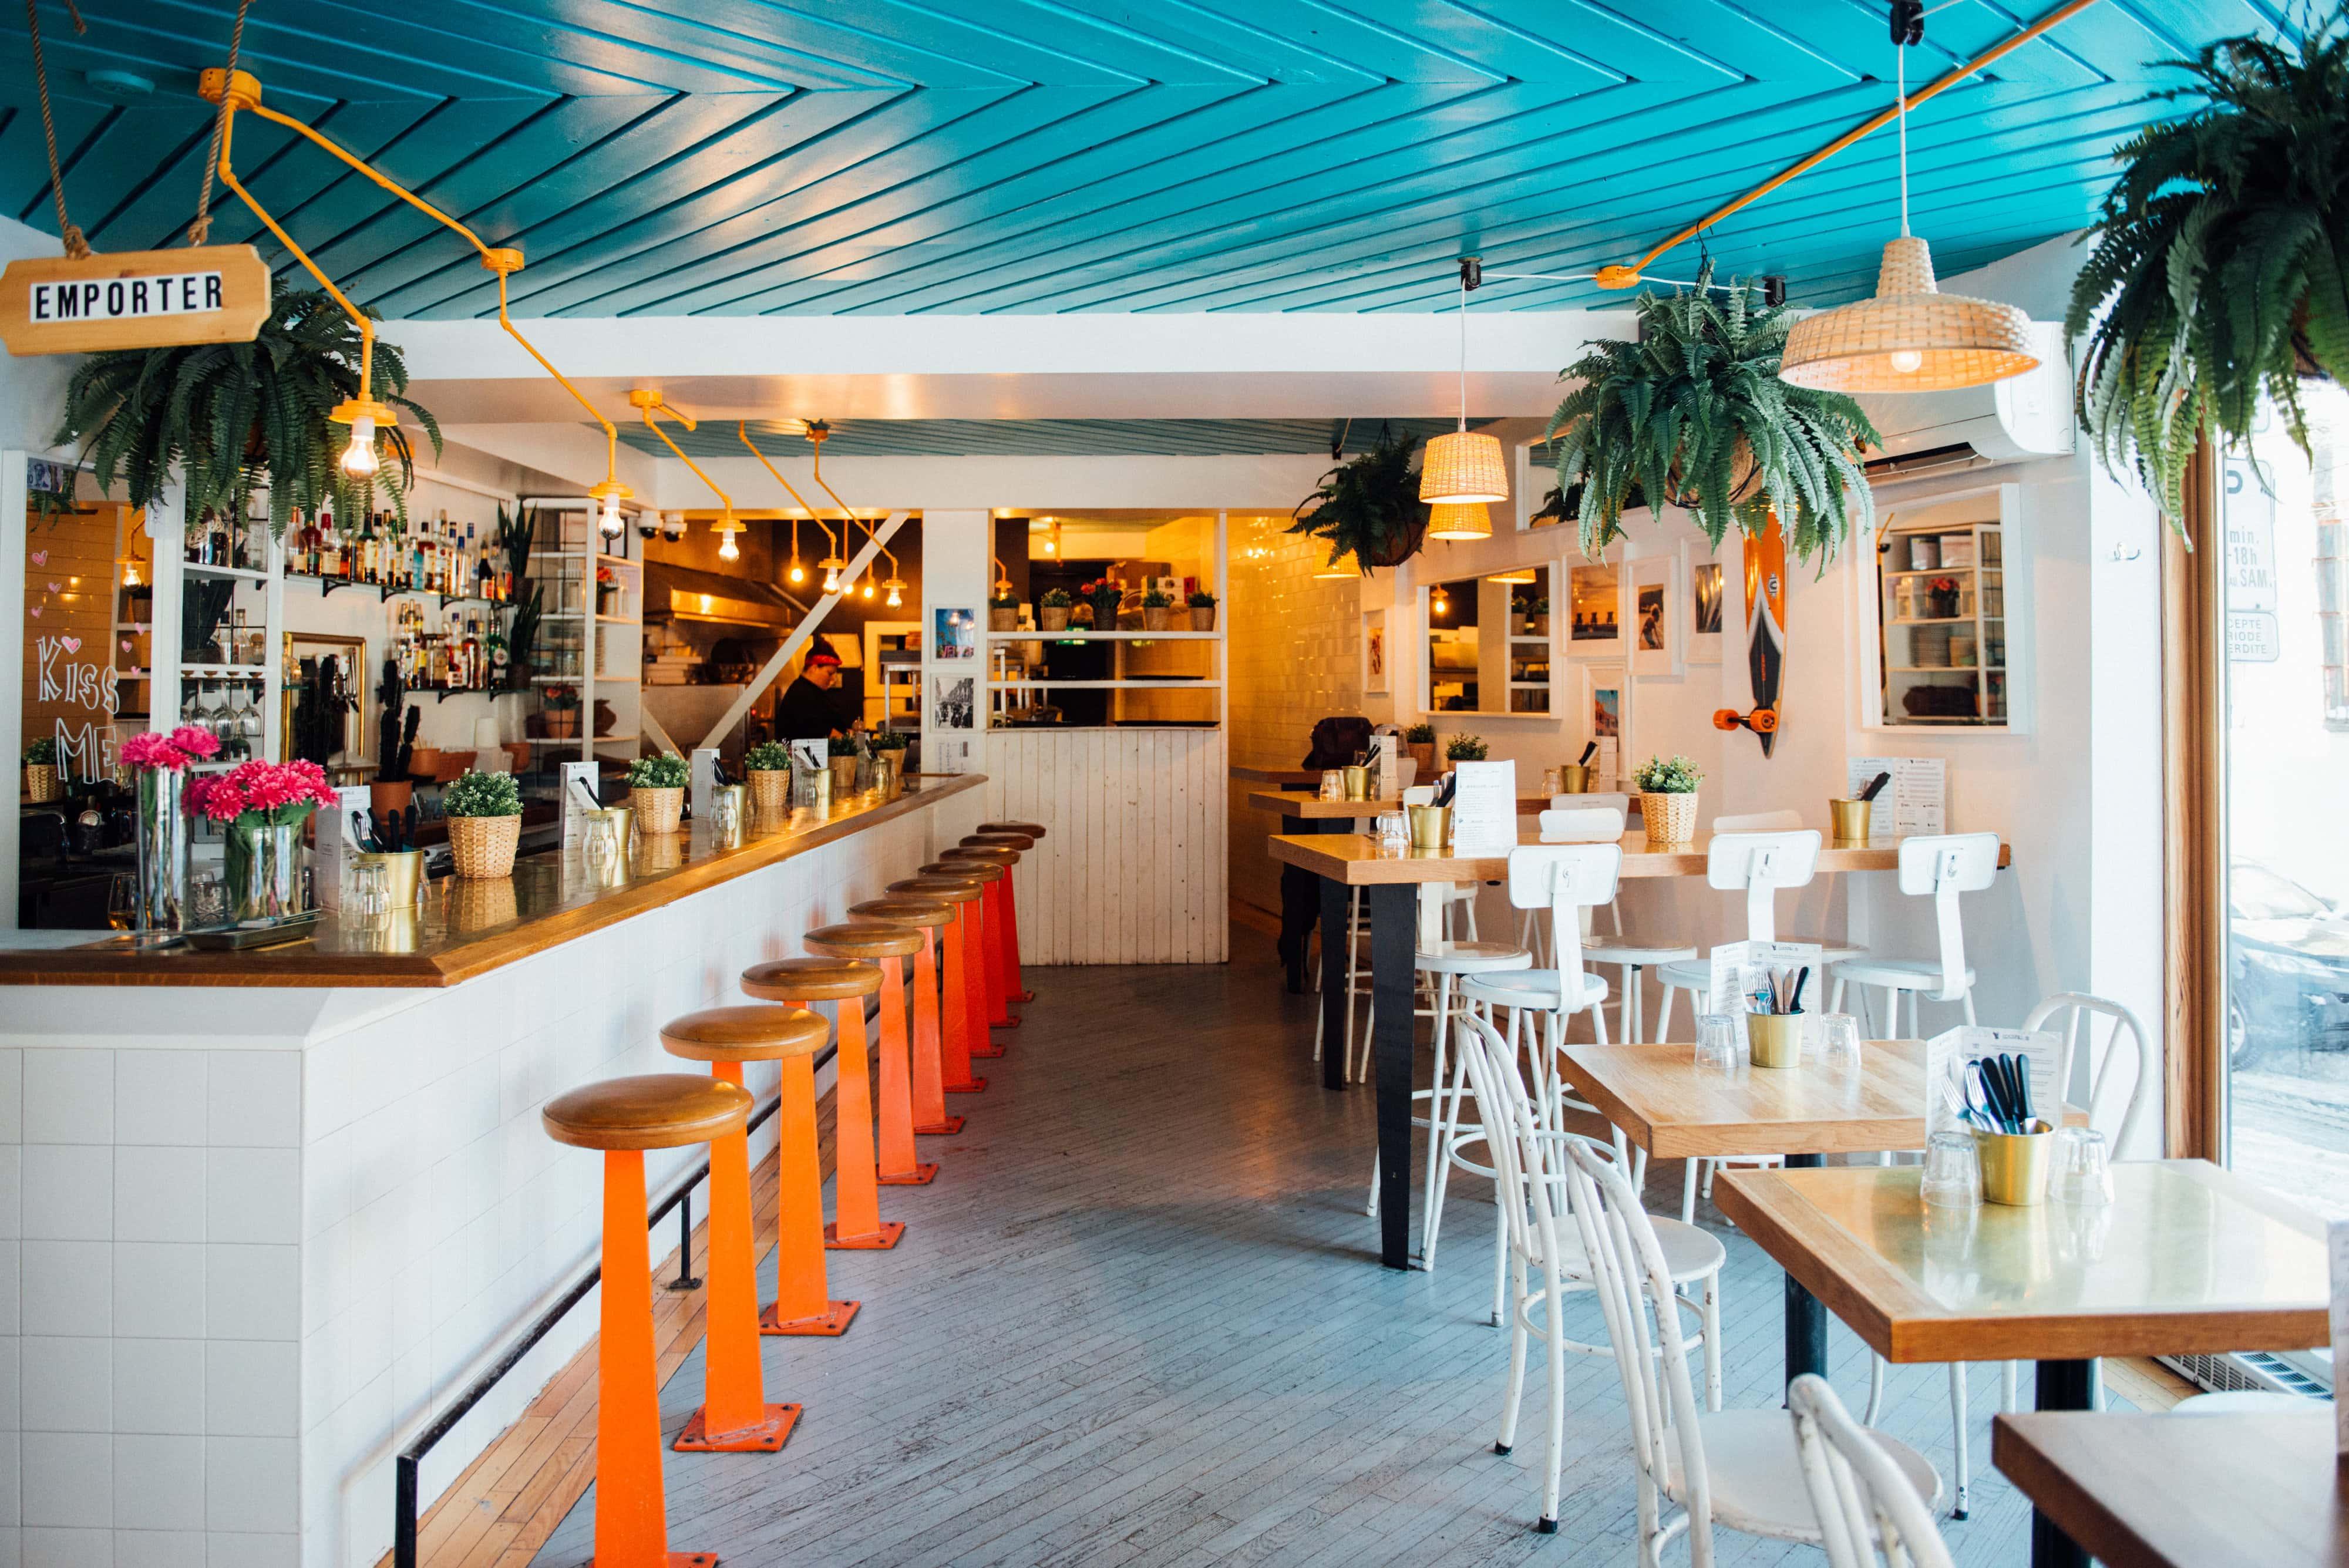 venice mtl saint-henri restaurant montreal